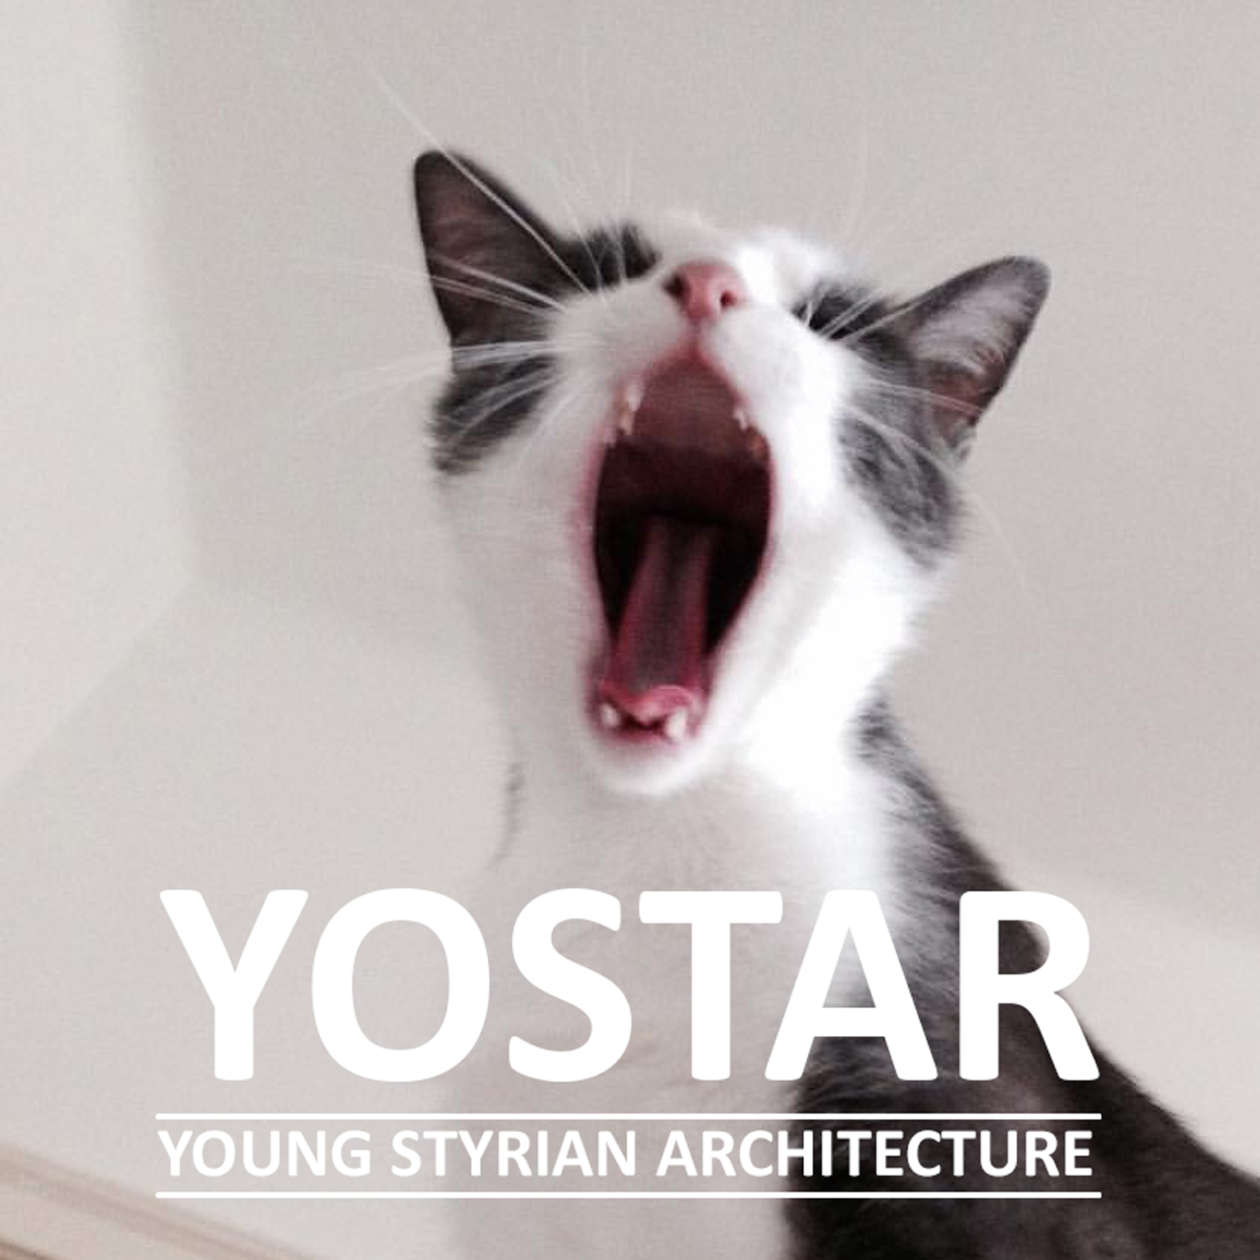 Yostar Young Styrian Architecture Katze